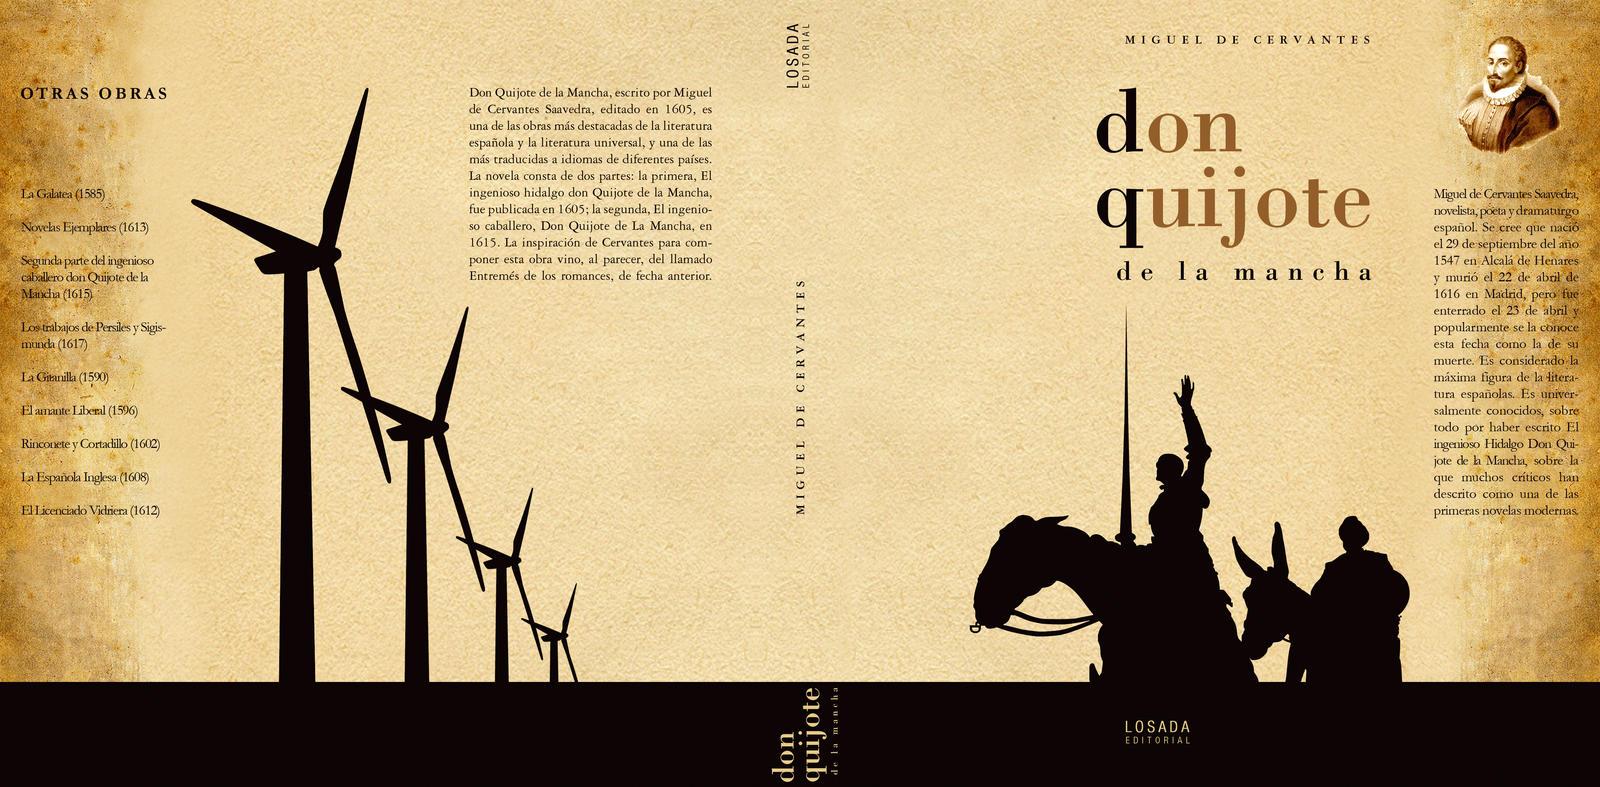 Don Quijote De La Mancha by chugarcube on DeviantArt